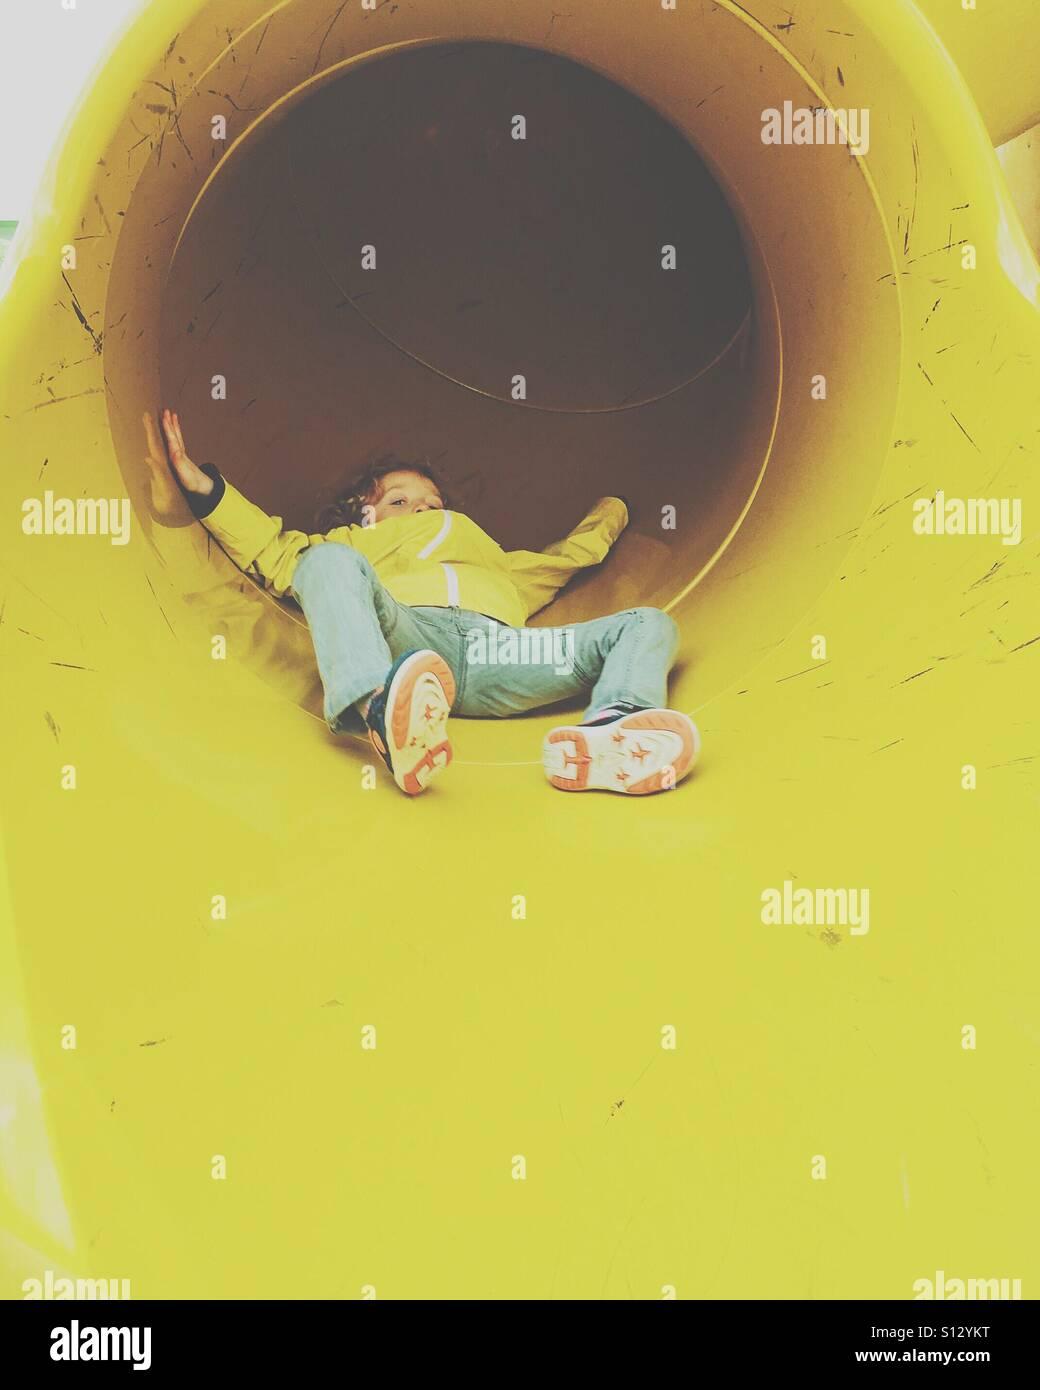 Boy coming down slide - Stock Image